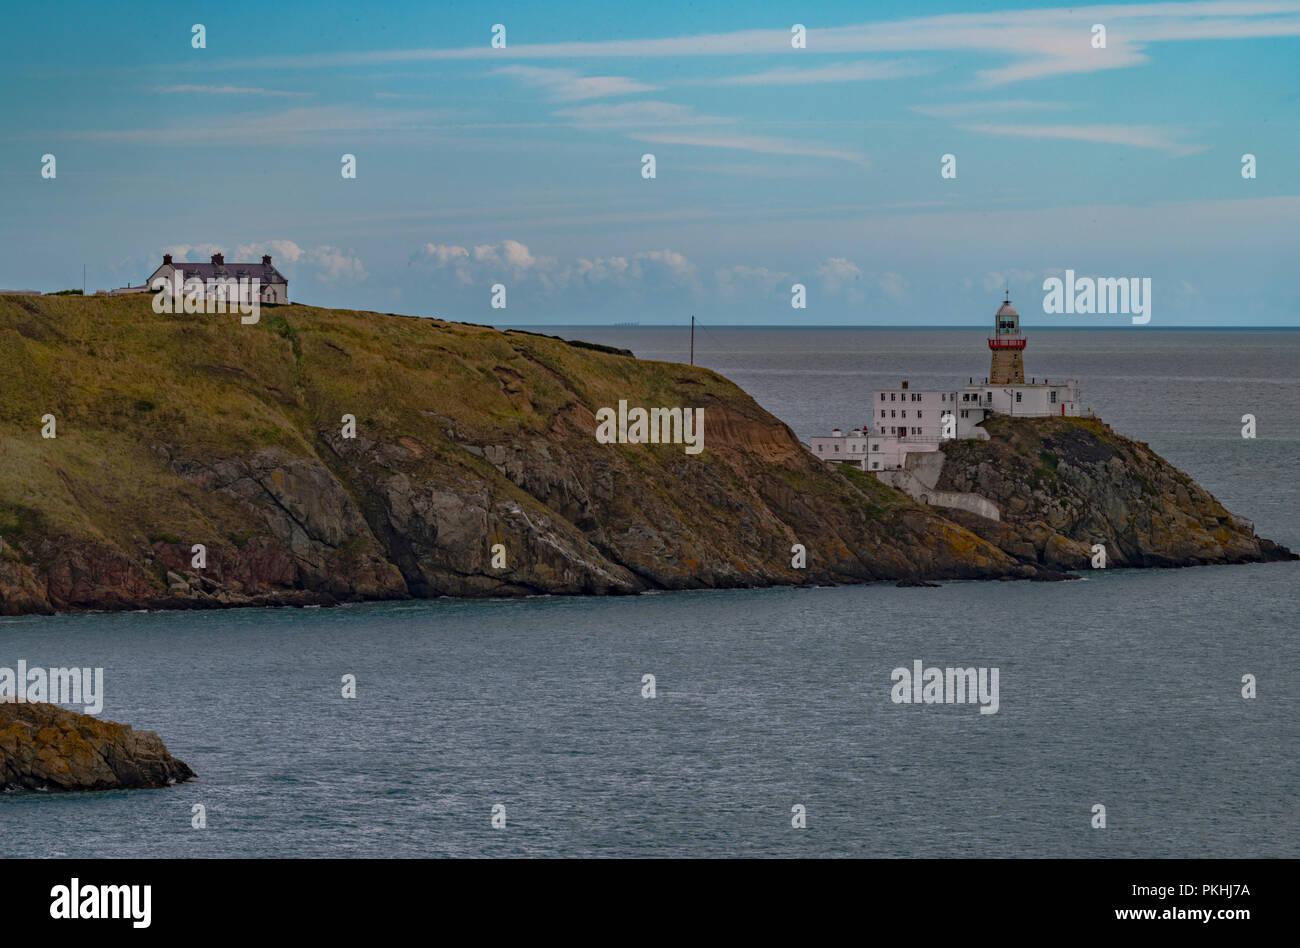 Baily Lighthouse Howth Dublin Ireland - Stock Image